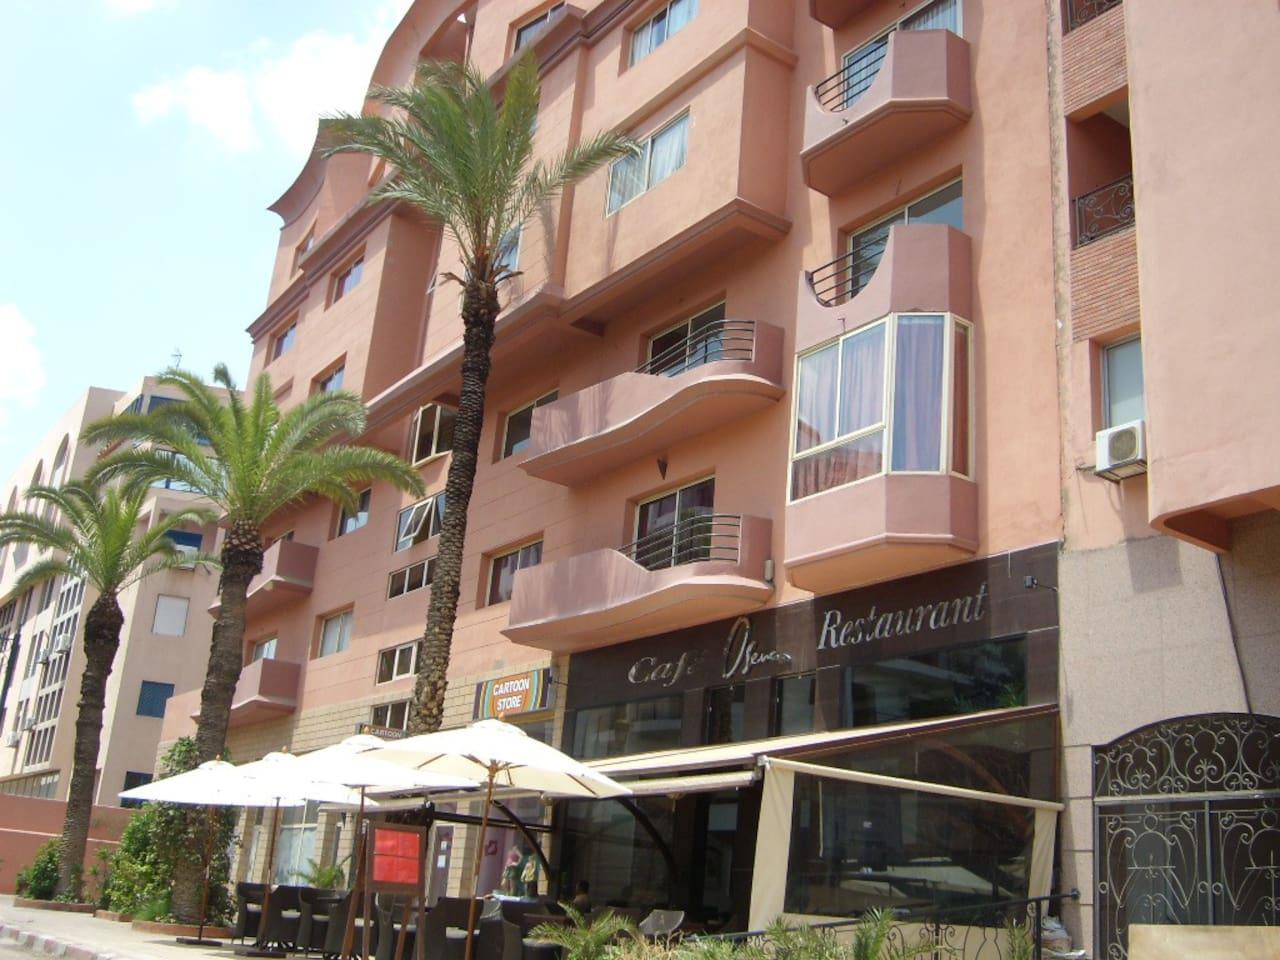 Marrakech-Gueliz-Plaza Top located!